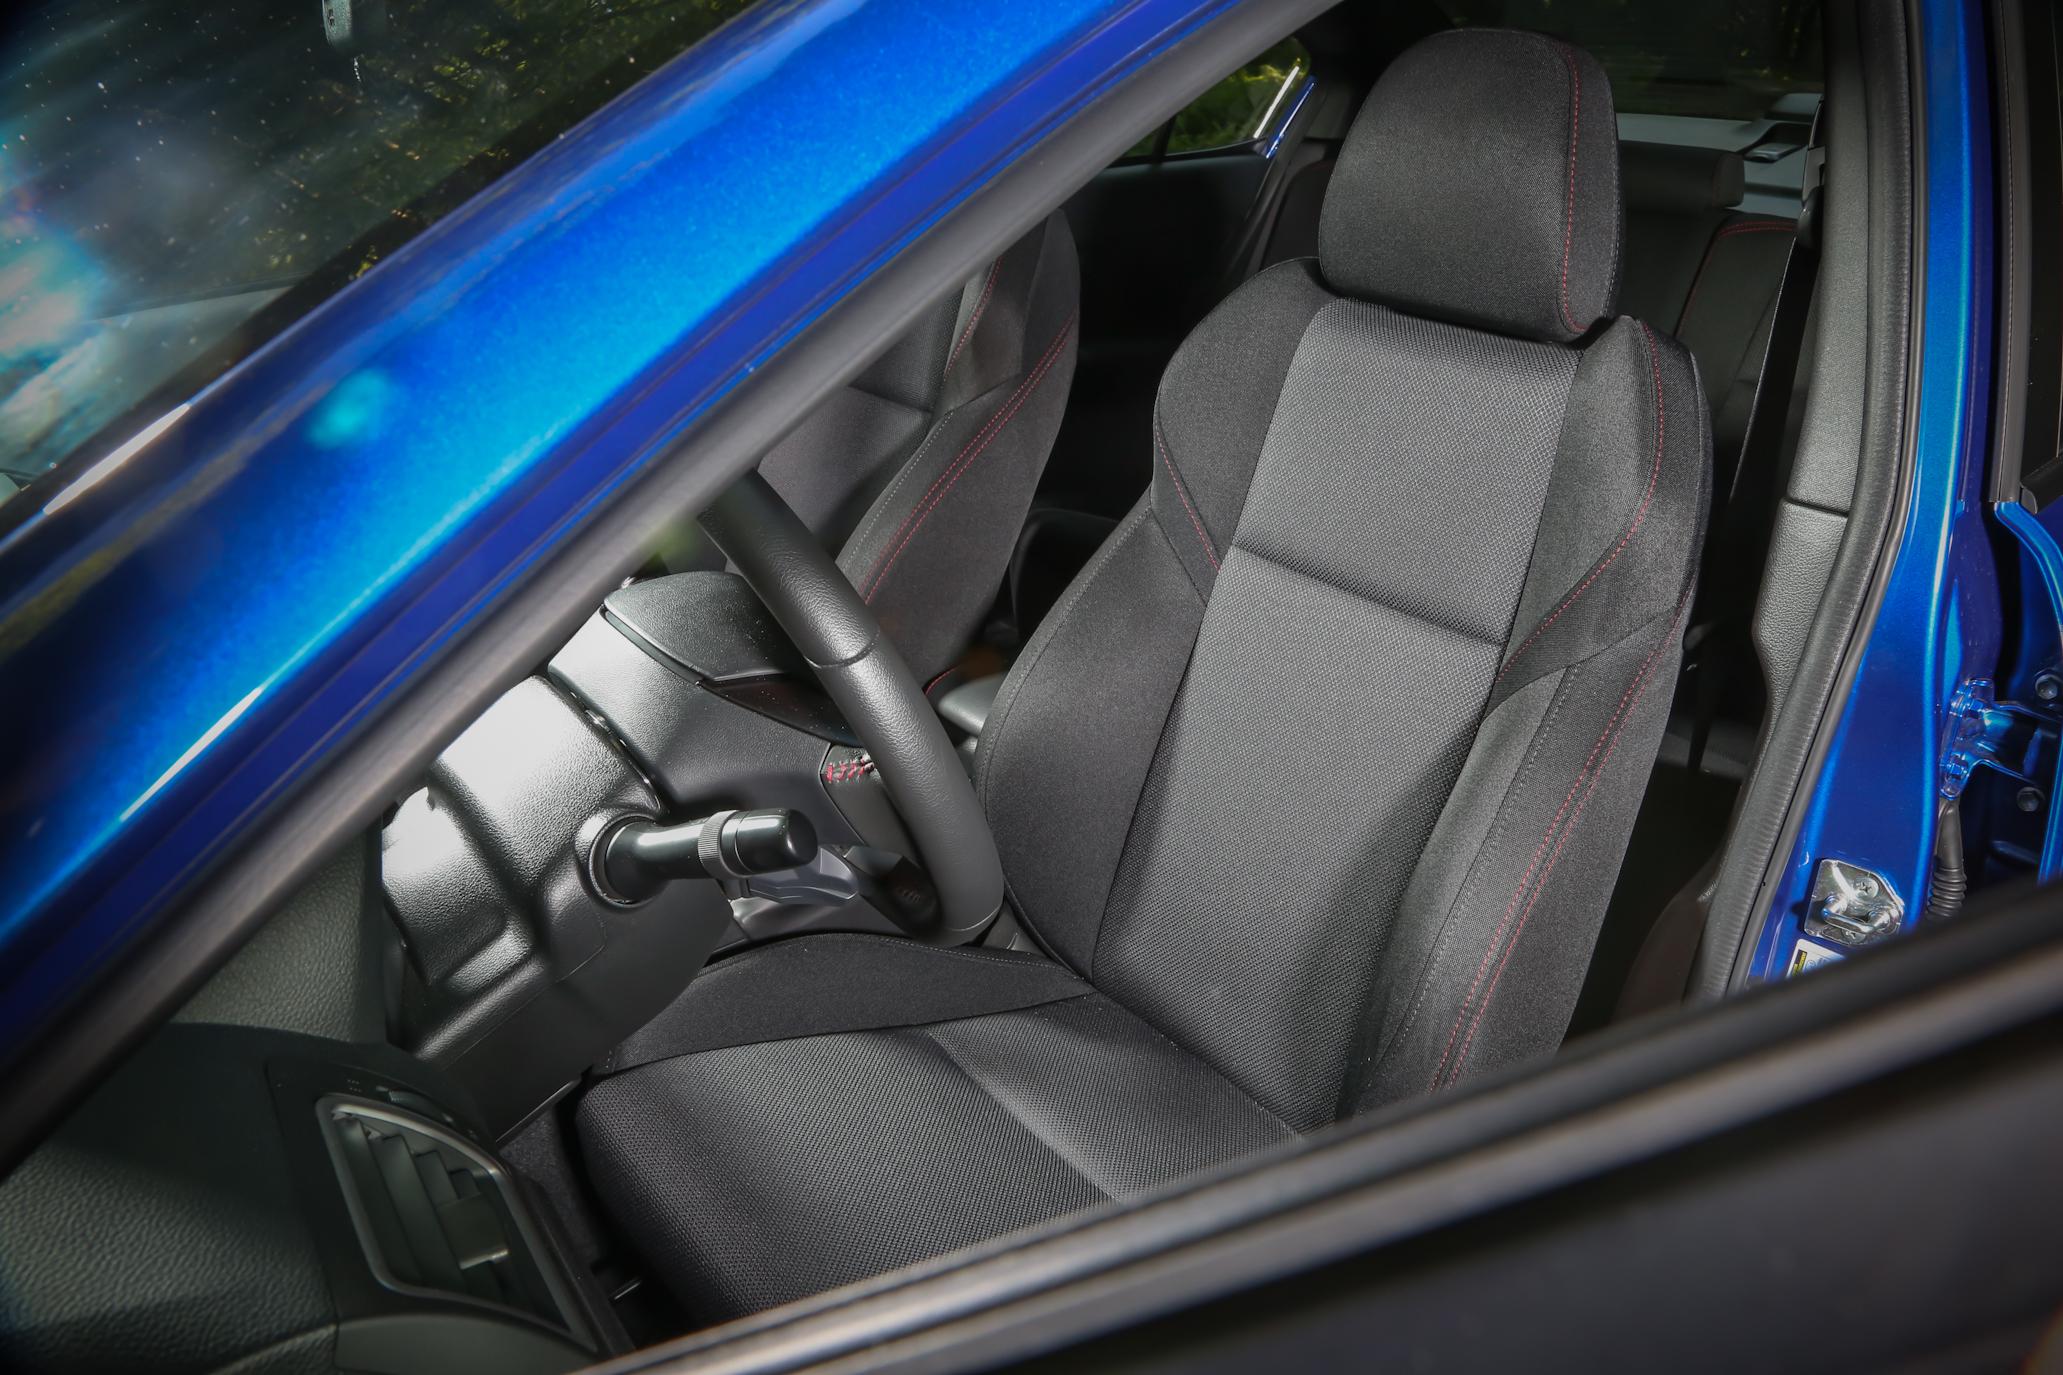 2015 Subaru WRX Front Seat Interior